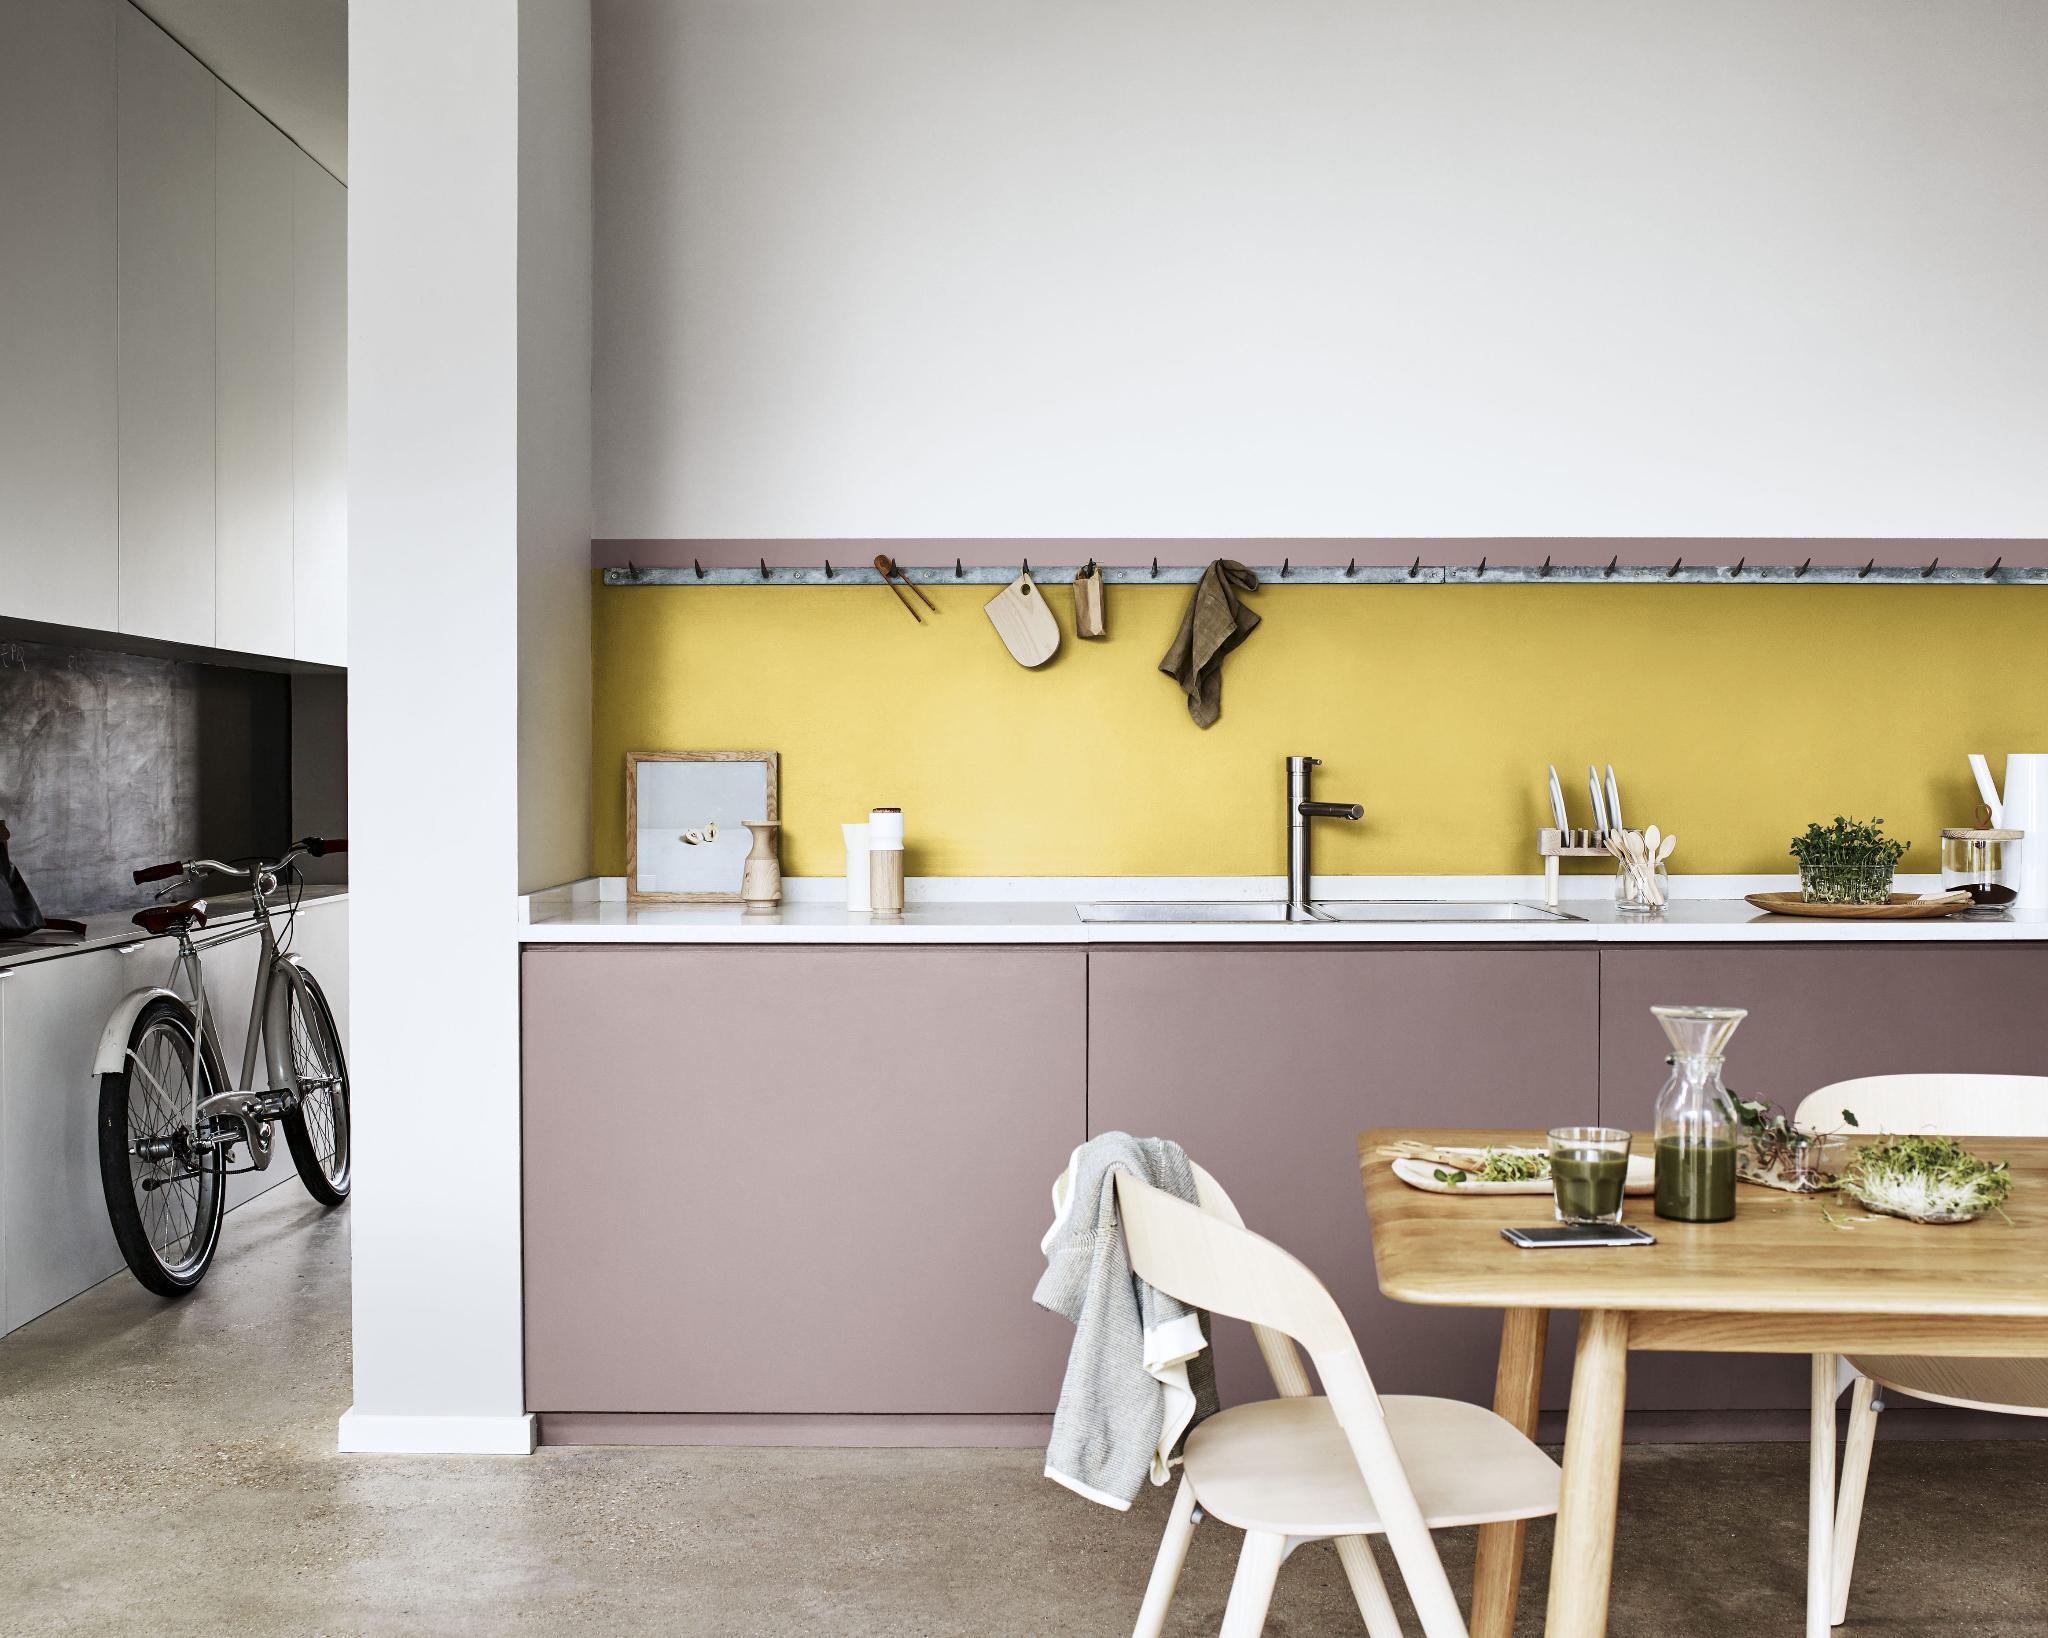 cf18_consumer_playful_rye_kitchen_1638-min.jpg